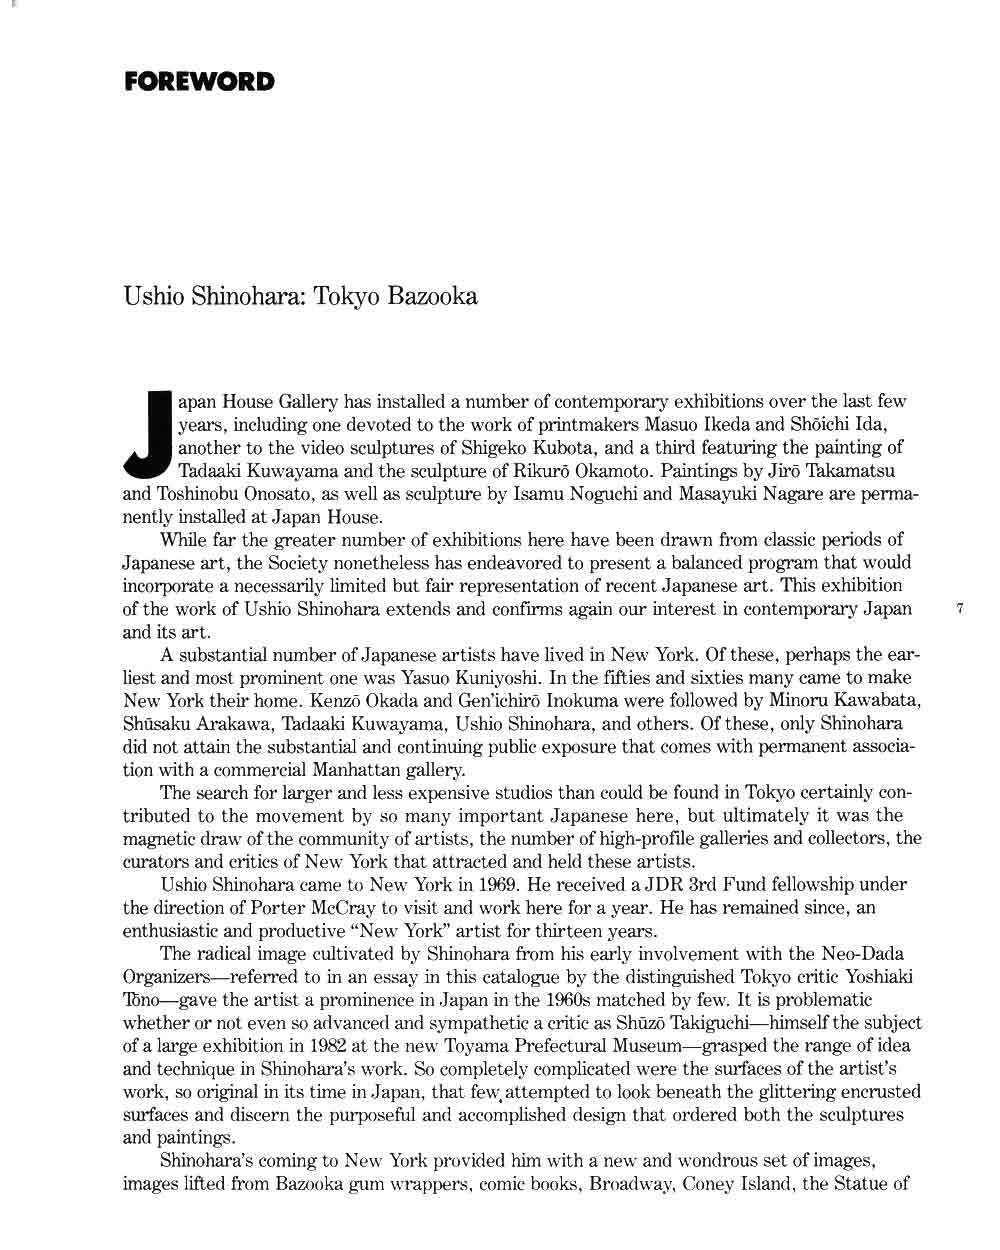 008 In Essay Citation Ushio Shinohara Tokyo Bazooka Pg 1 Striking Text Parenthetical Example Apa Multiple Authors Website Full